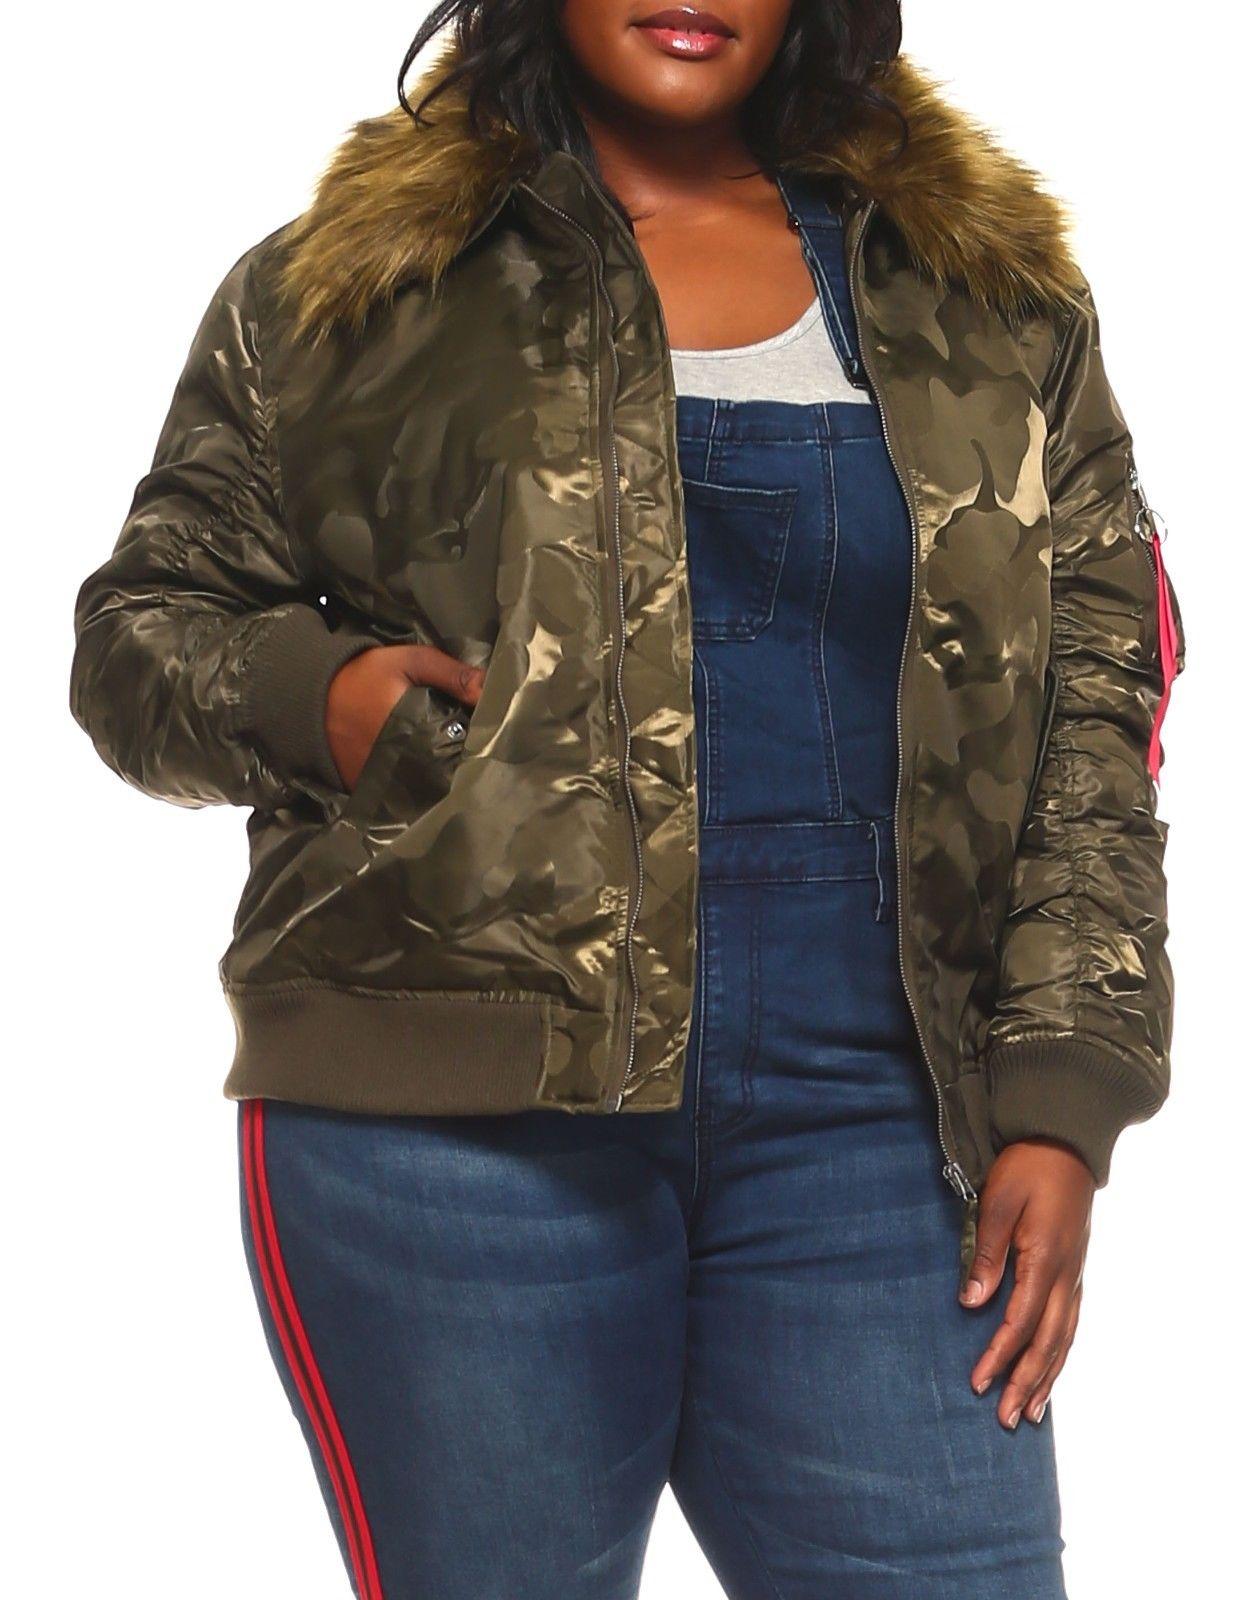 d4bd4aaa0 Genx - Womens Plus Size Winter Faux Fur Puffer Bomber Parka Jacket ...